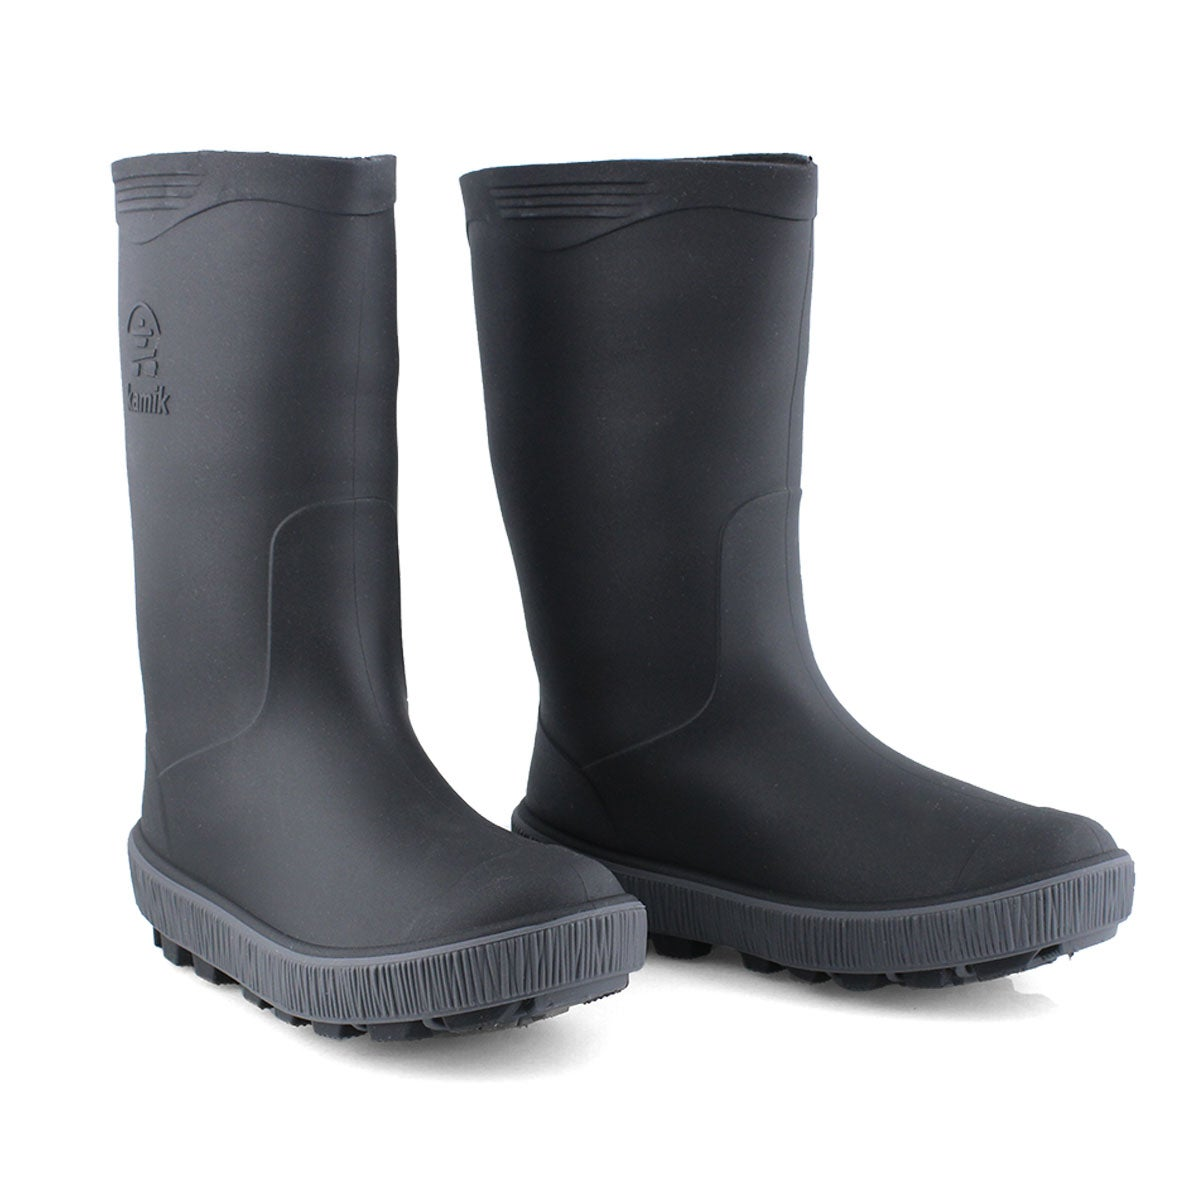 Boys' Riptide Waterproof Rain Boot - Blk/Charcoal